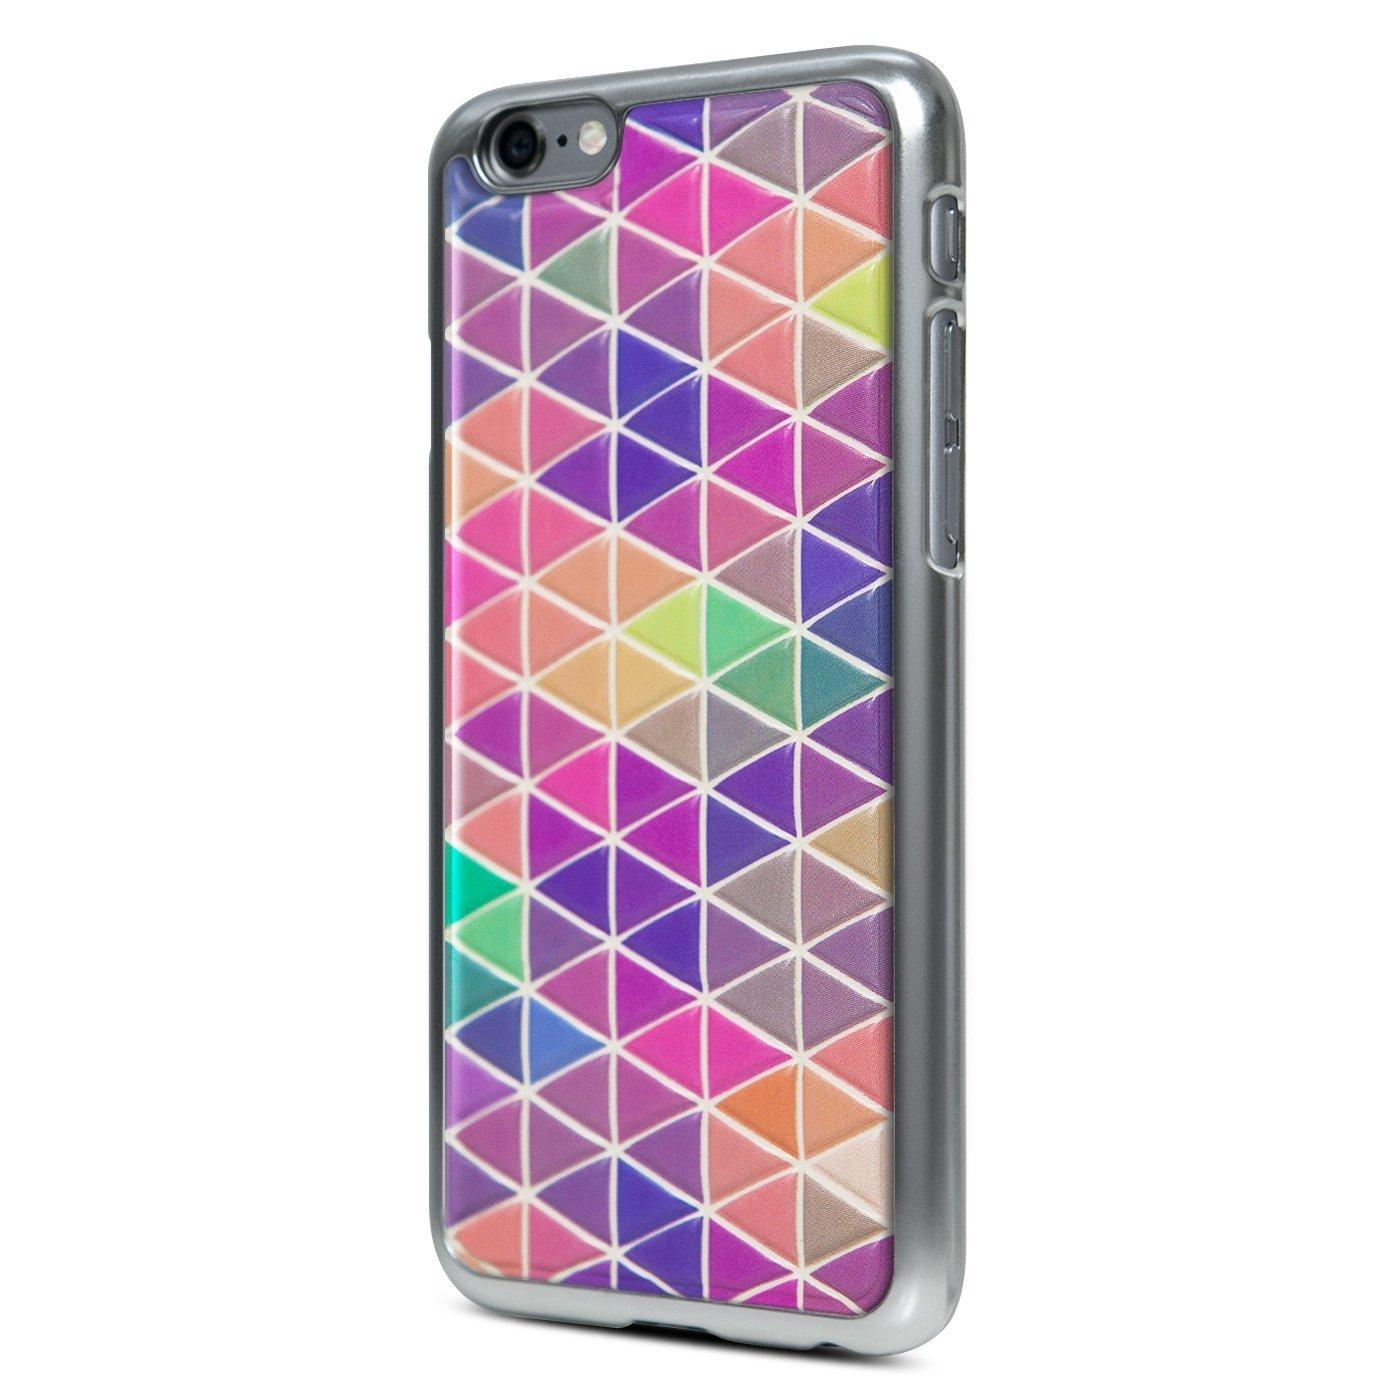 Id AMERICA. Cushi bảo vệ bộ iphone6 4.7 inch dùng vỏ kim loại Original [Deco] csie601 Deco